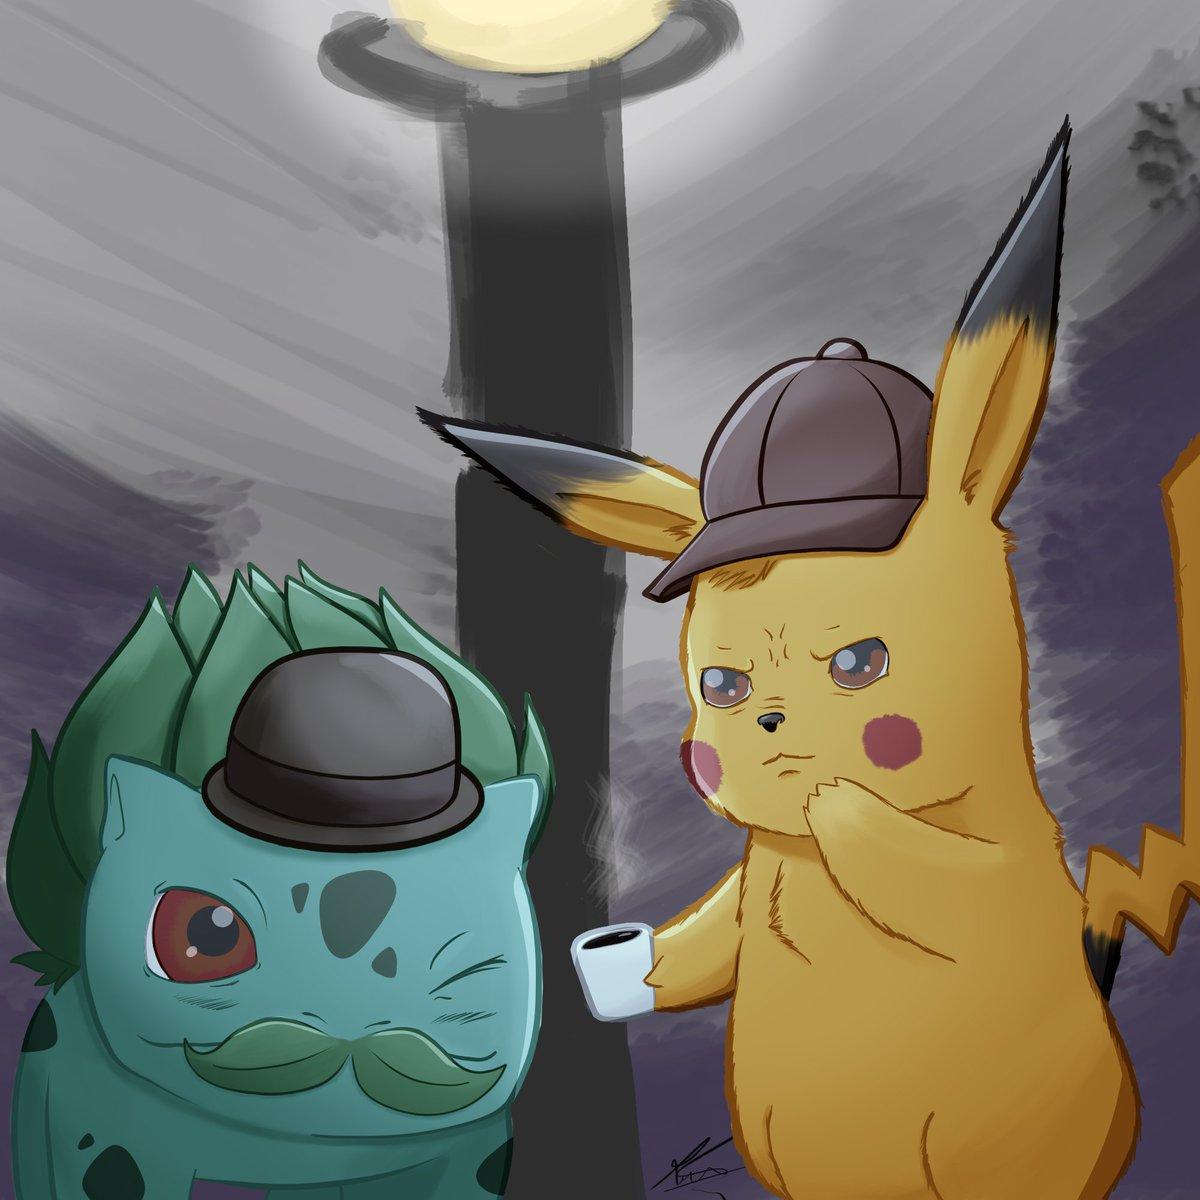 Kinda late, been really busy with studies lately, but here it is! Detective Pikachu and his Assistant Bulbasaur! #doodle #illustration #desenho #art #arte #fanart #artedefa #ilustração #pikachu #detetivepikachu #detectivepikachu #film #pokemon #anime #ryanreynolds #nintendo